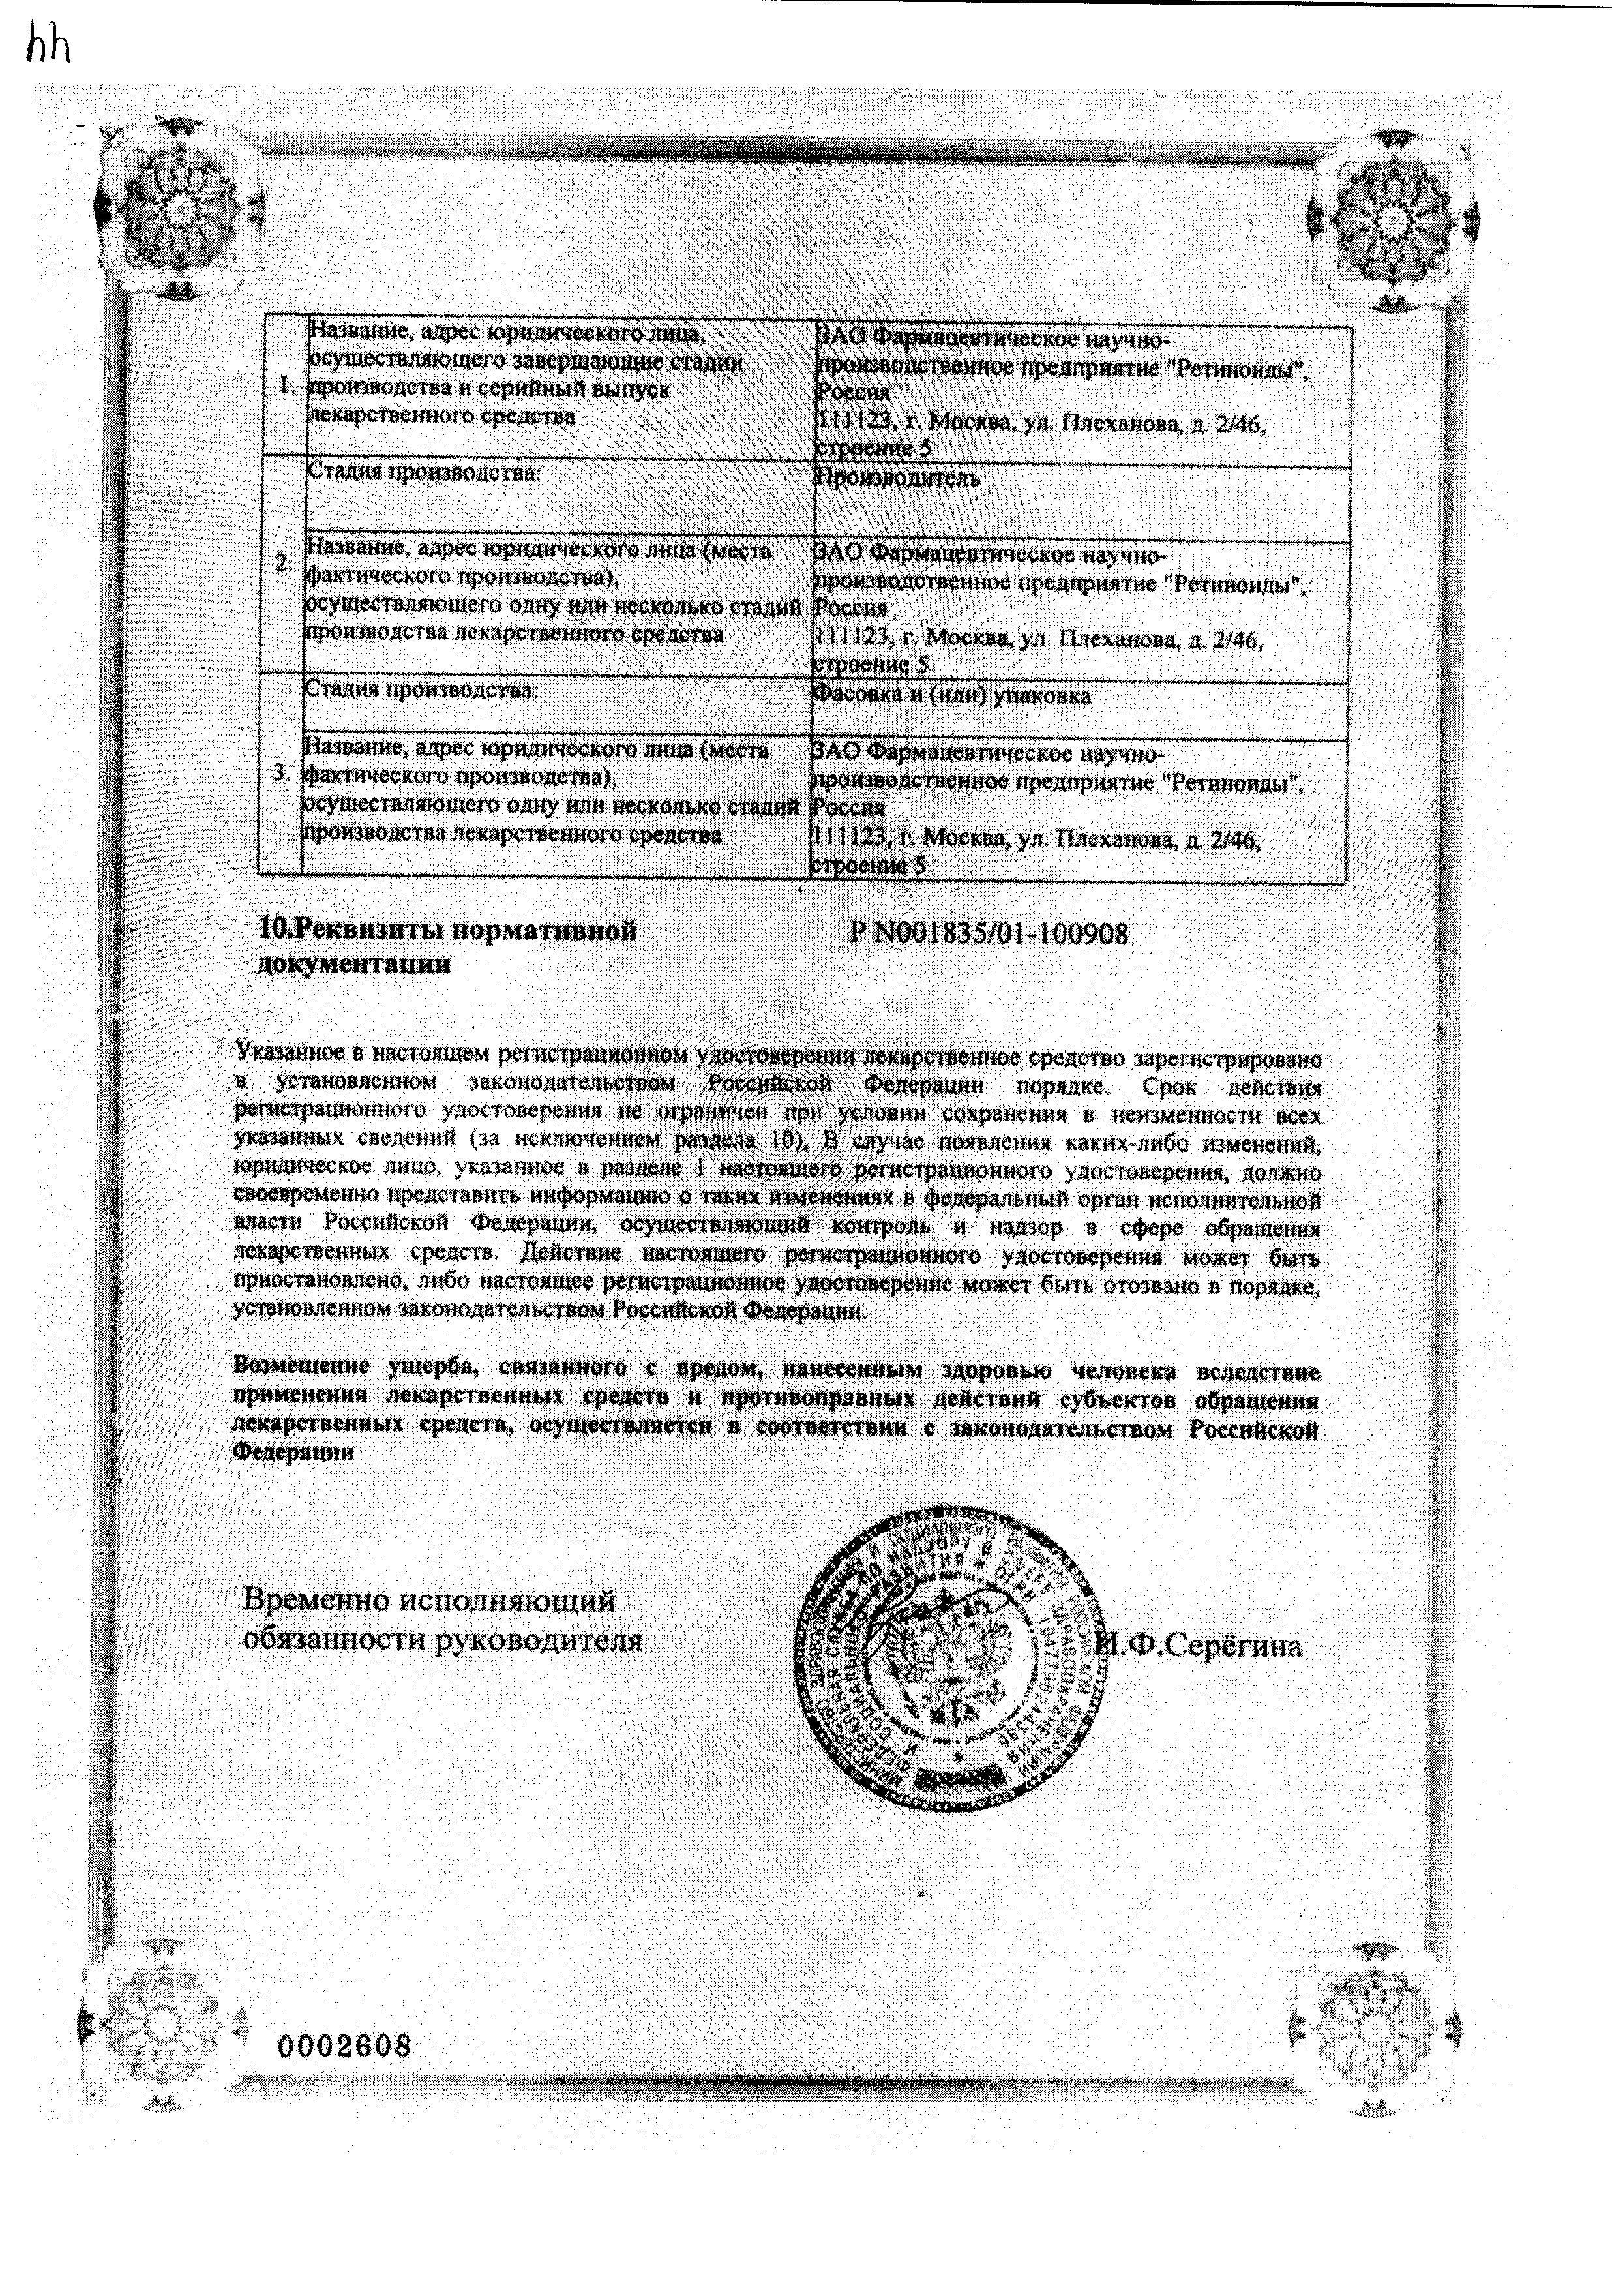 Веррукацид сертификат